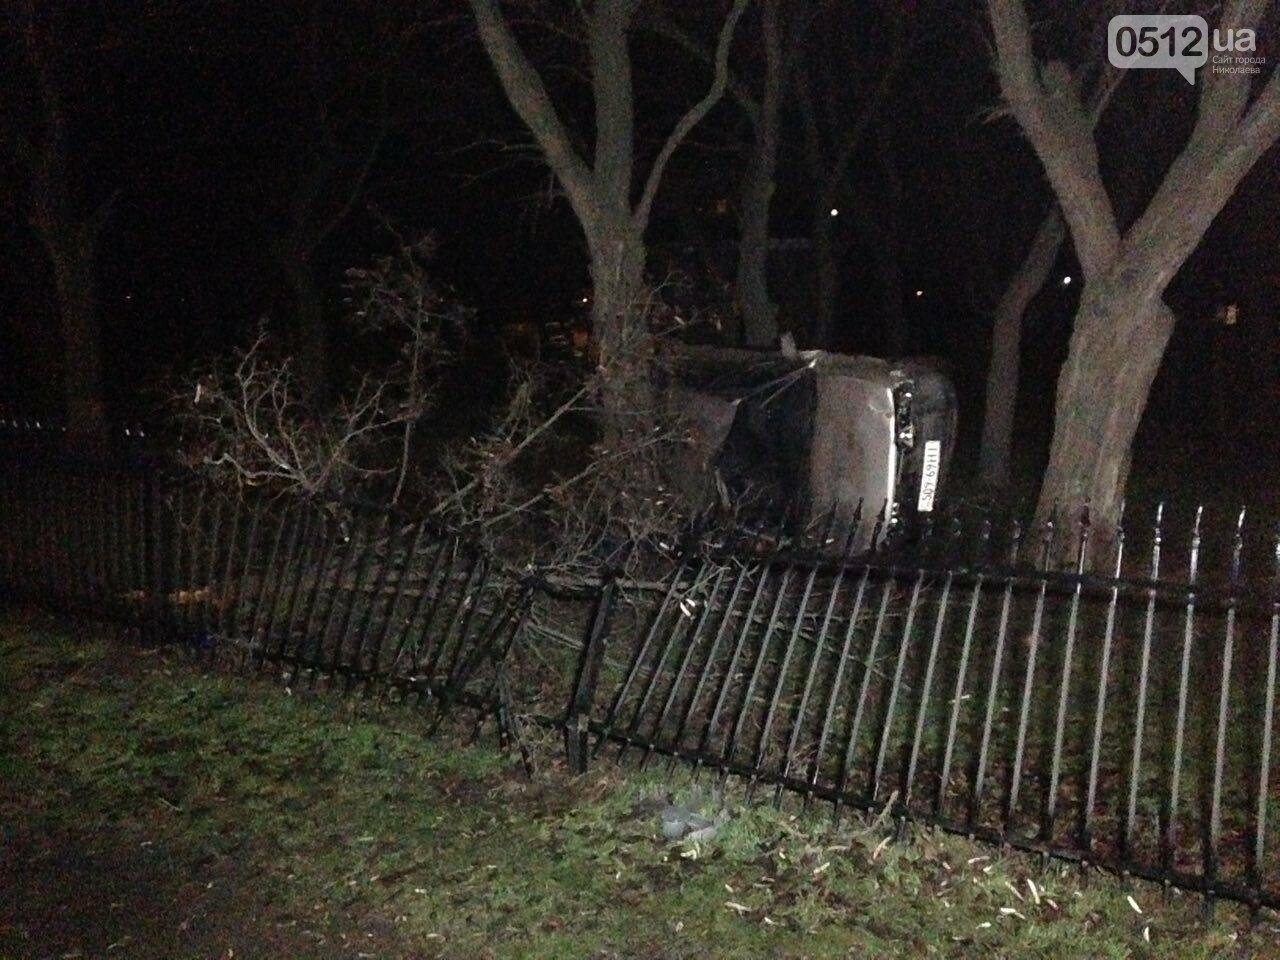 Страшное ДТП в Николаеве: 2 парня и 2 девушки на Мазде влетели в дерево - водитель умер на месте аварии, - ФОТО, фото-10